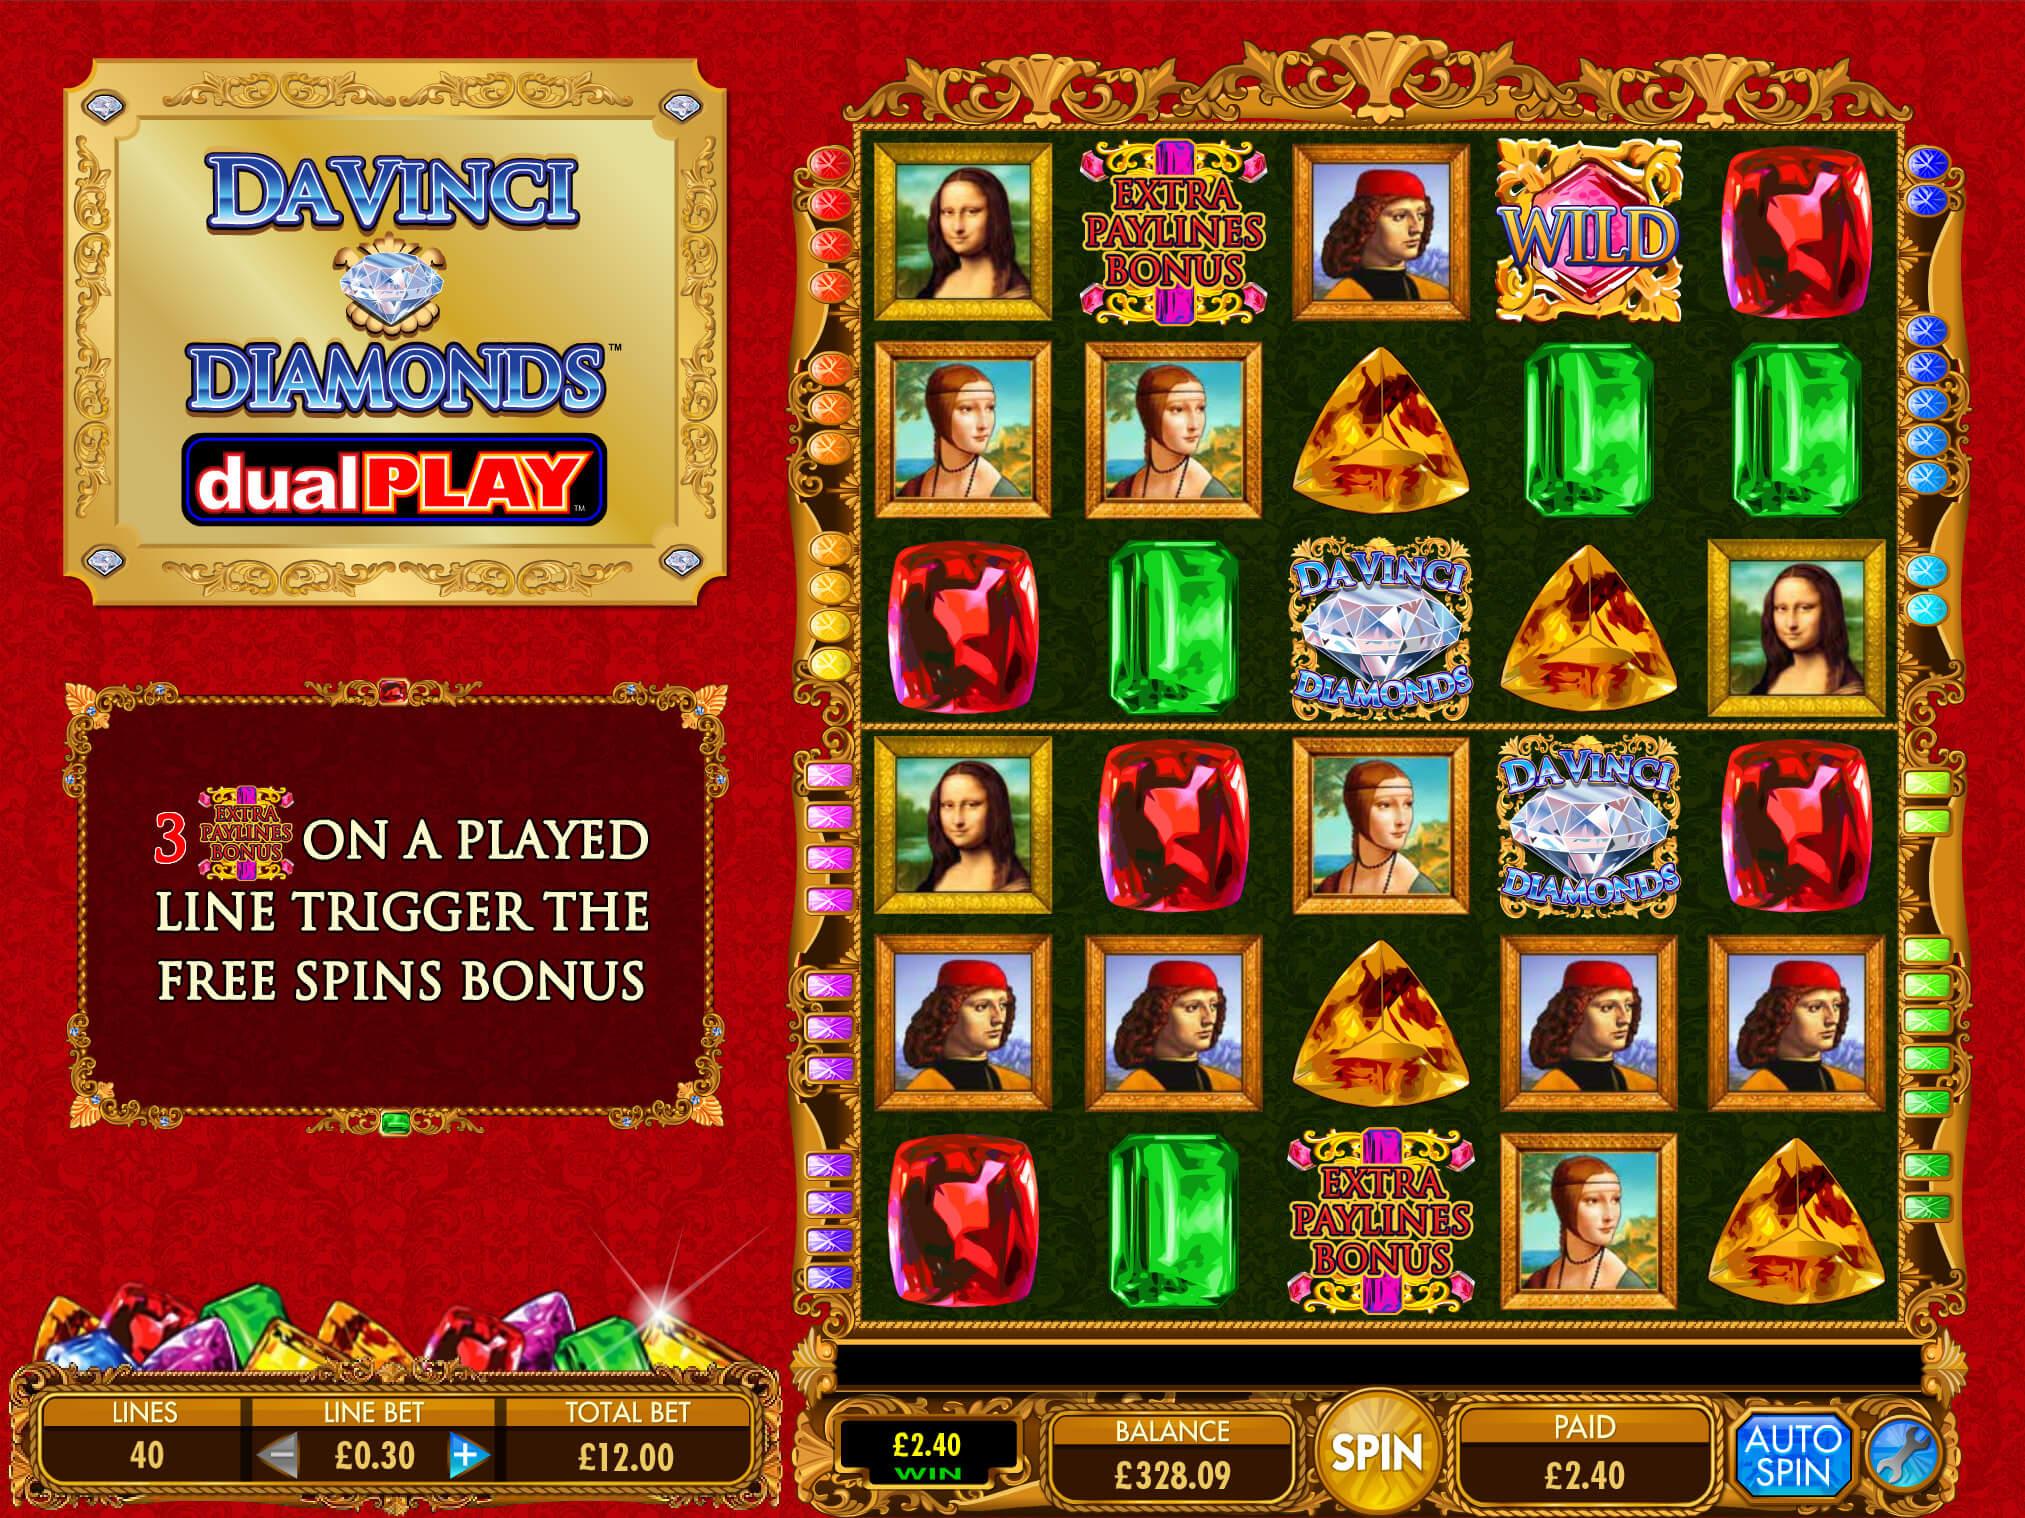 Screenshot of the game: Da Vinci Dual Play